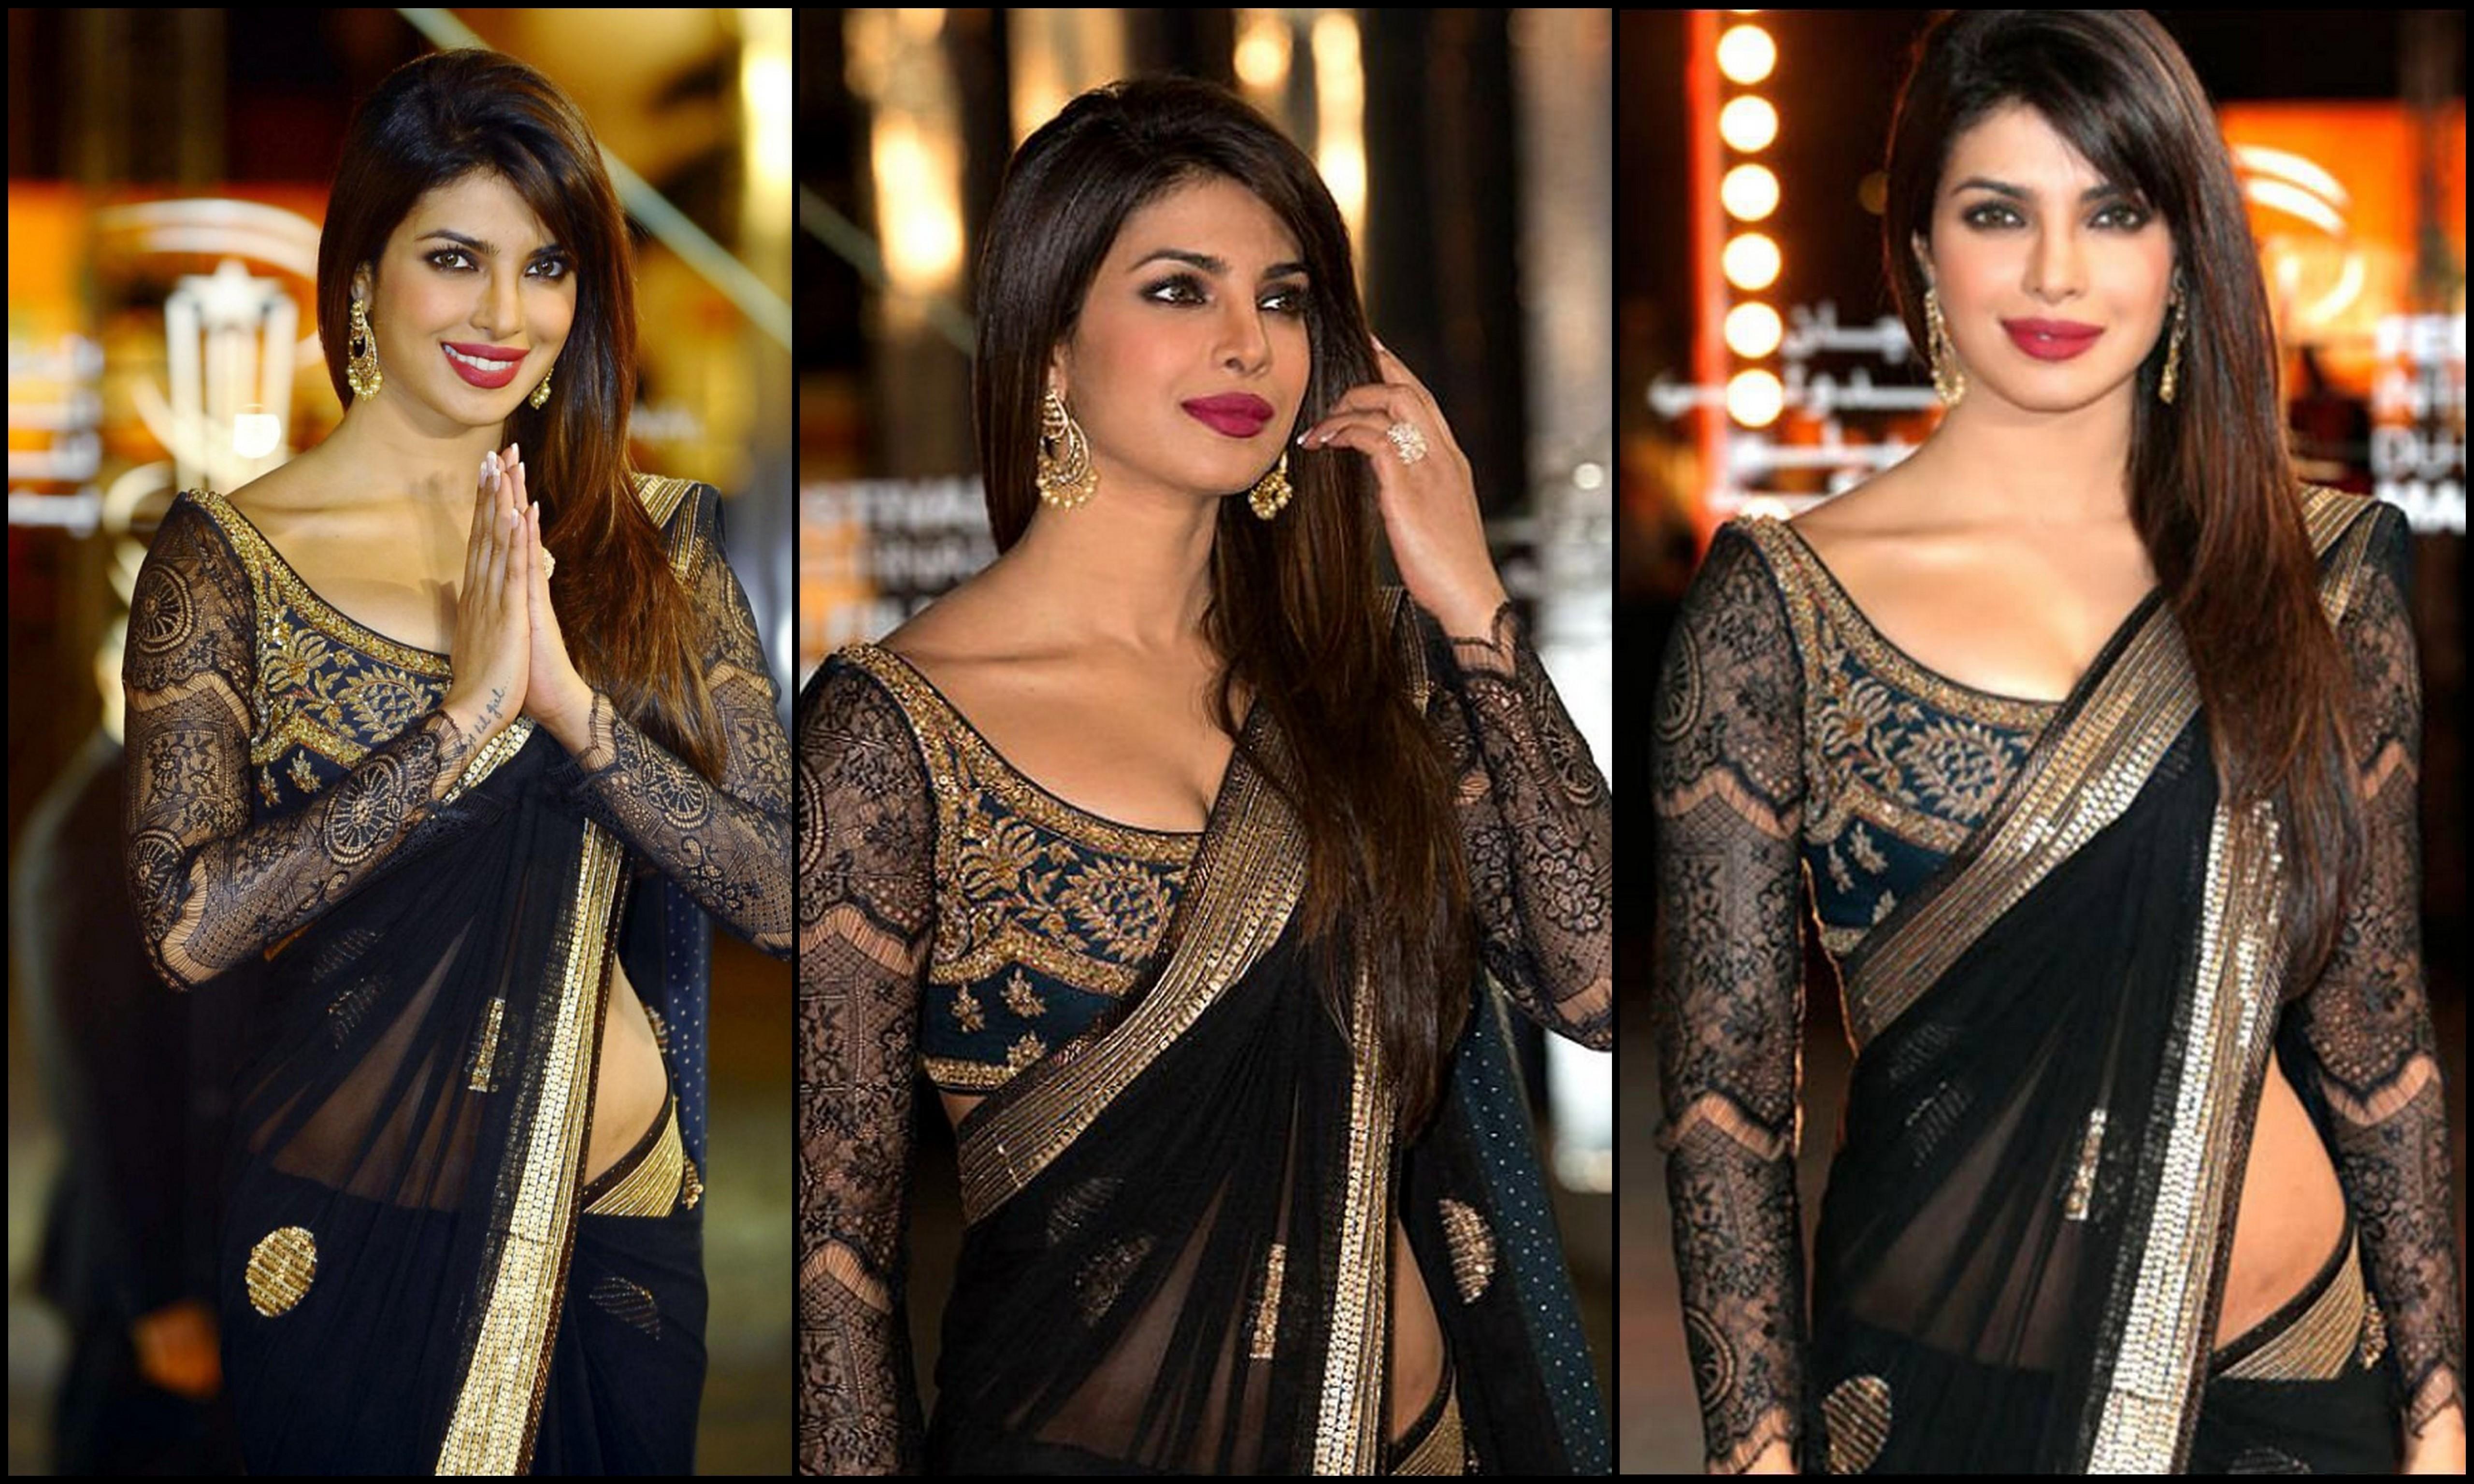 Priyanka to receive Dadasaheb Phalke Academy Award